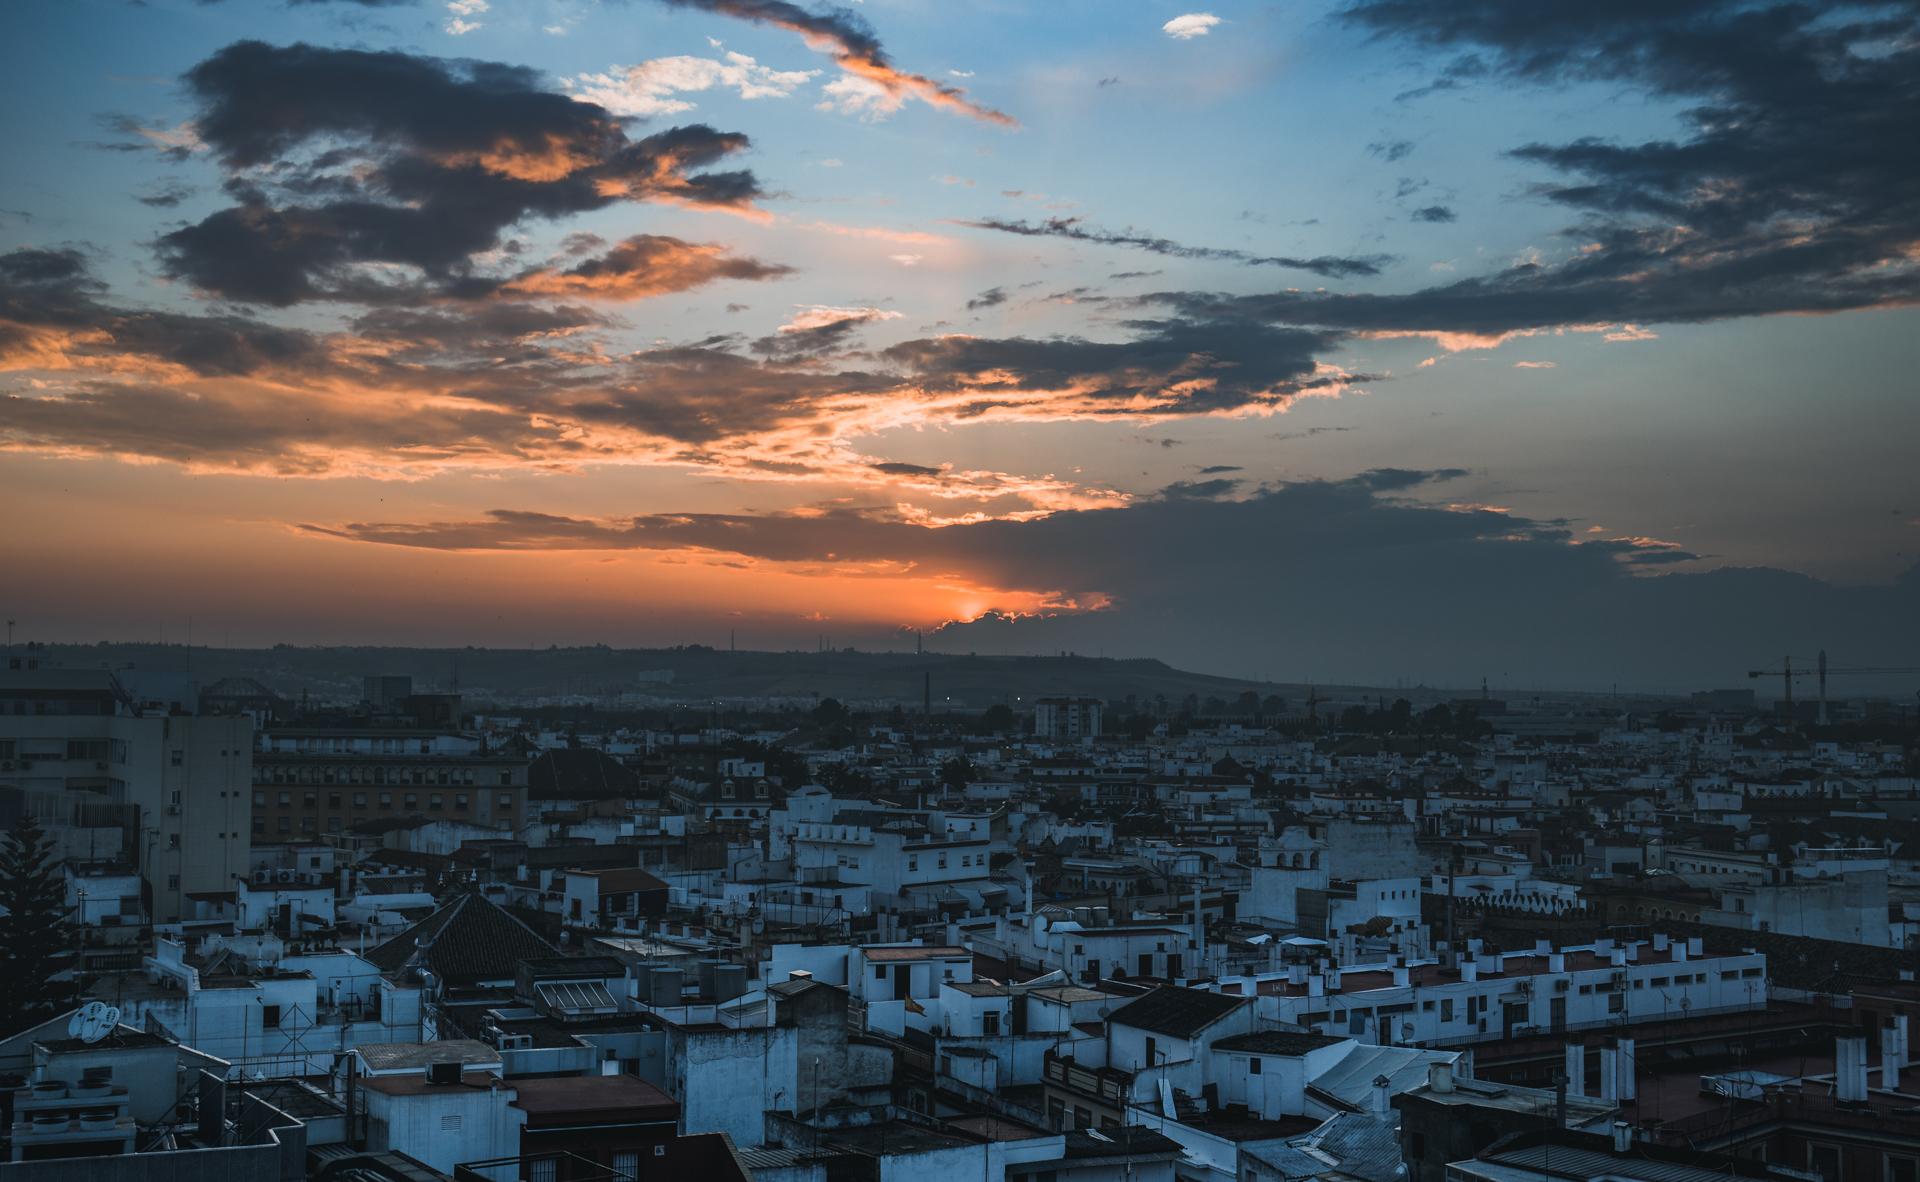 travel-blog-redhead-round-the-world-blogger-sunset-spain-sevilla.jpg